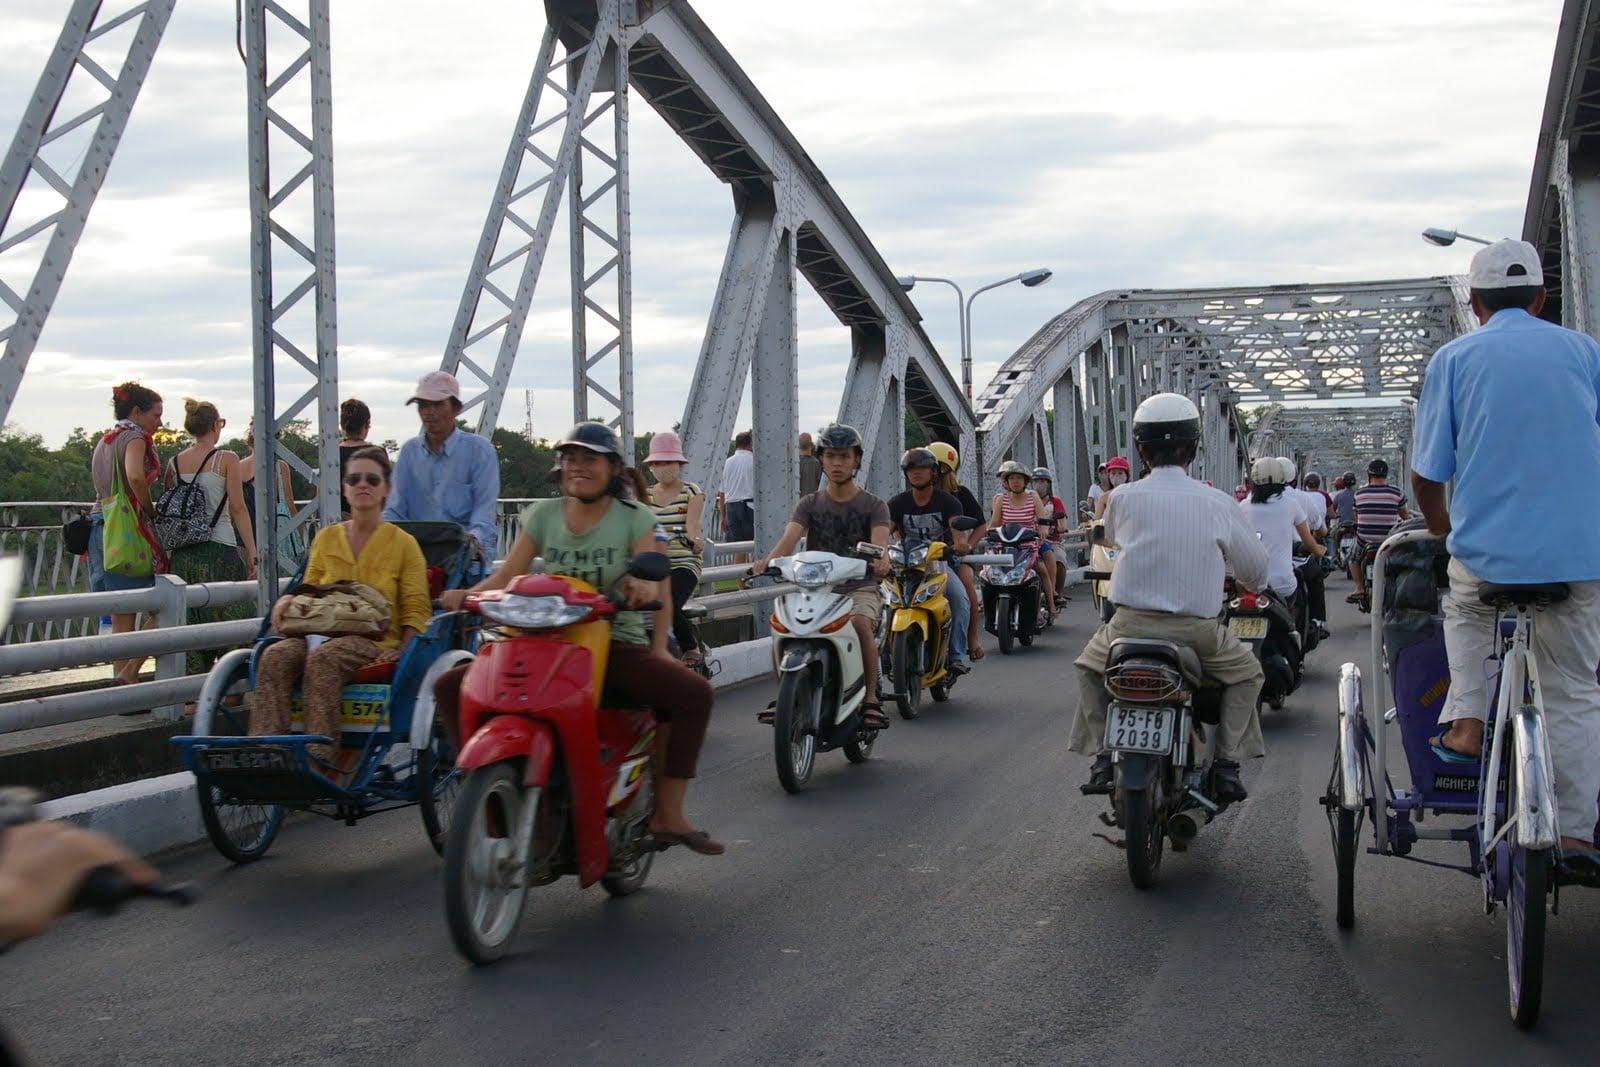 Hue cyclo tour Hoi an 038 Hue Day Tours